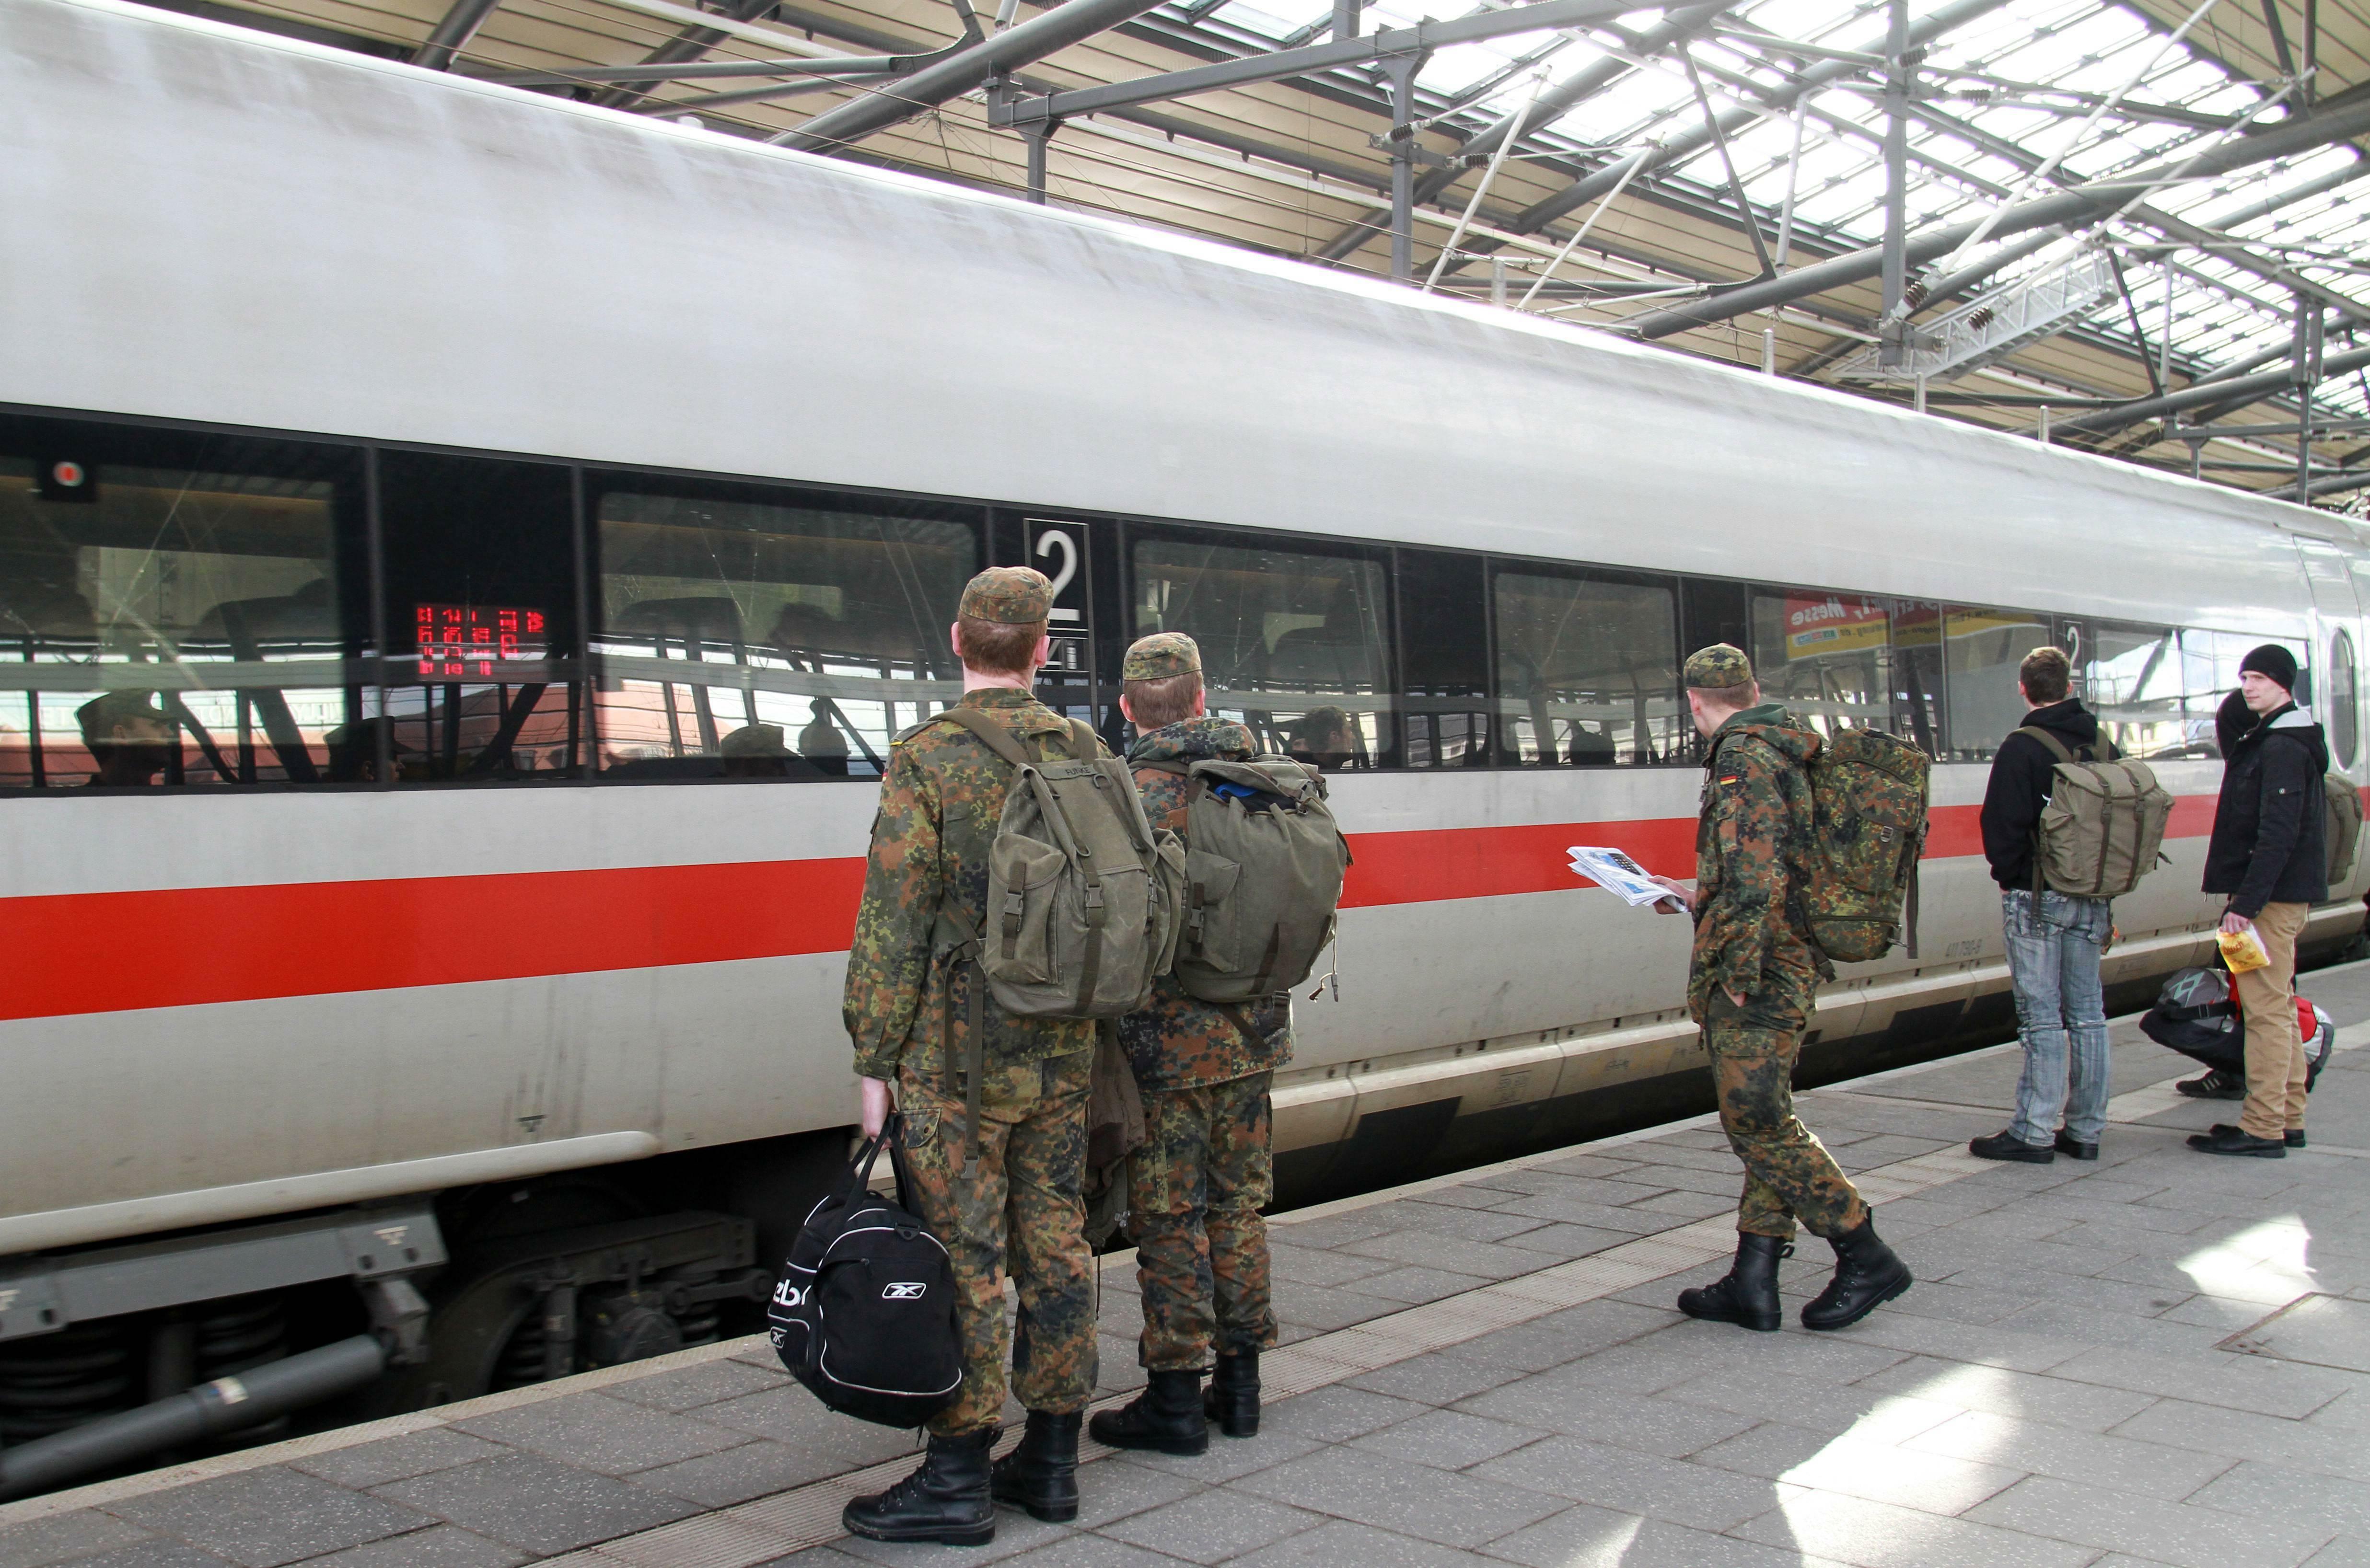 Soldaten in Uniform können ab 1. Januar 2020 kostenlos Bahn fahren